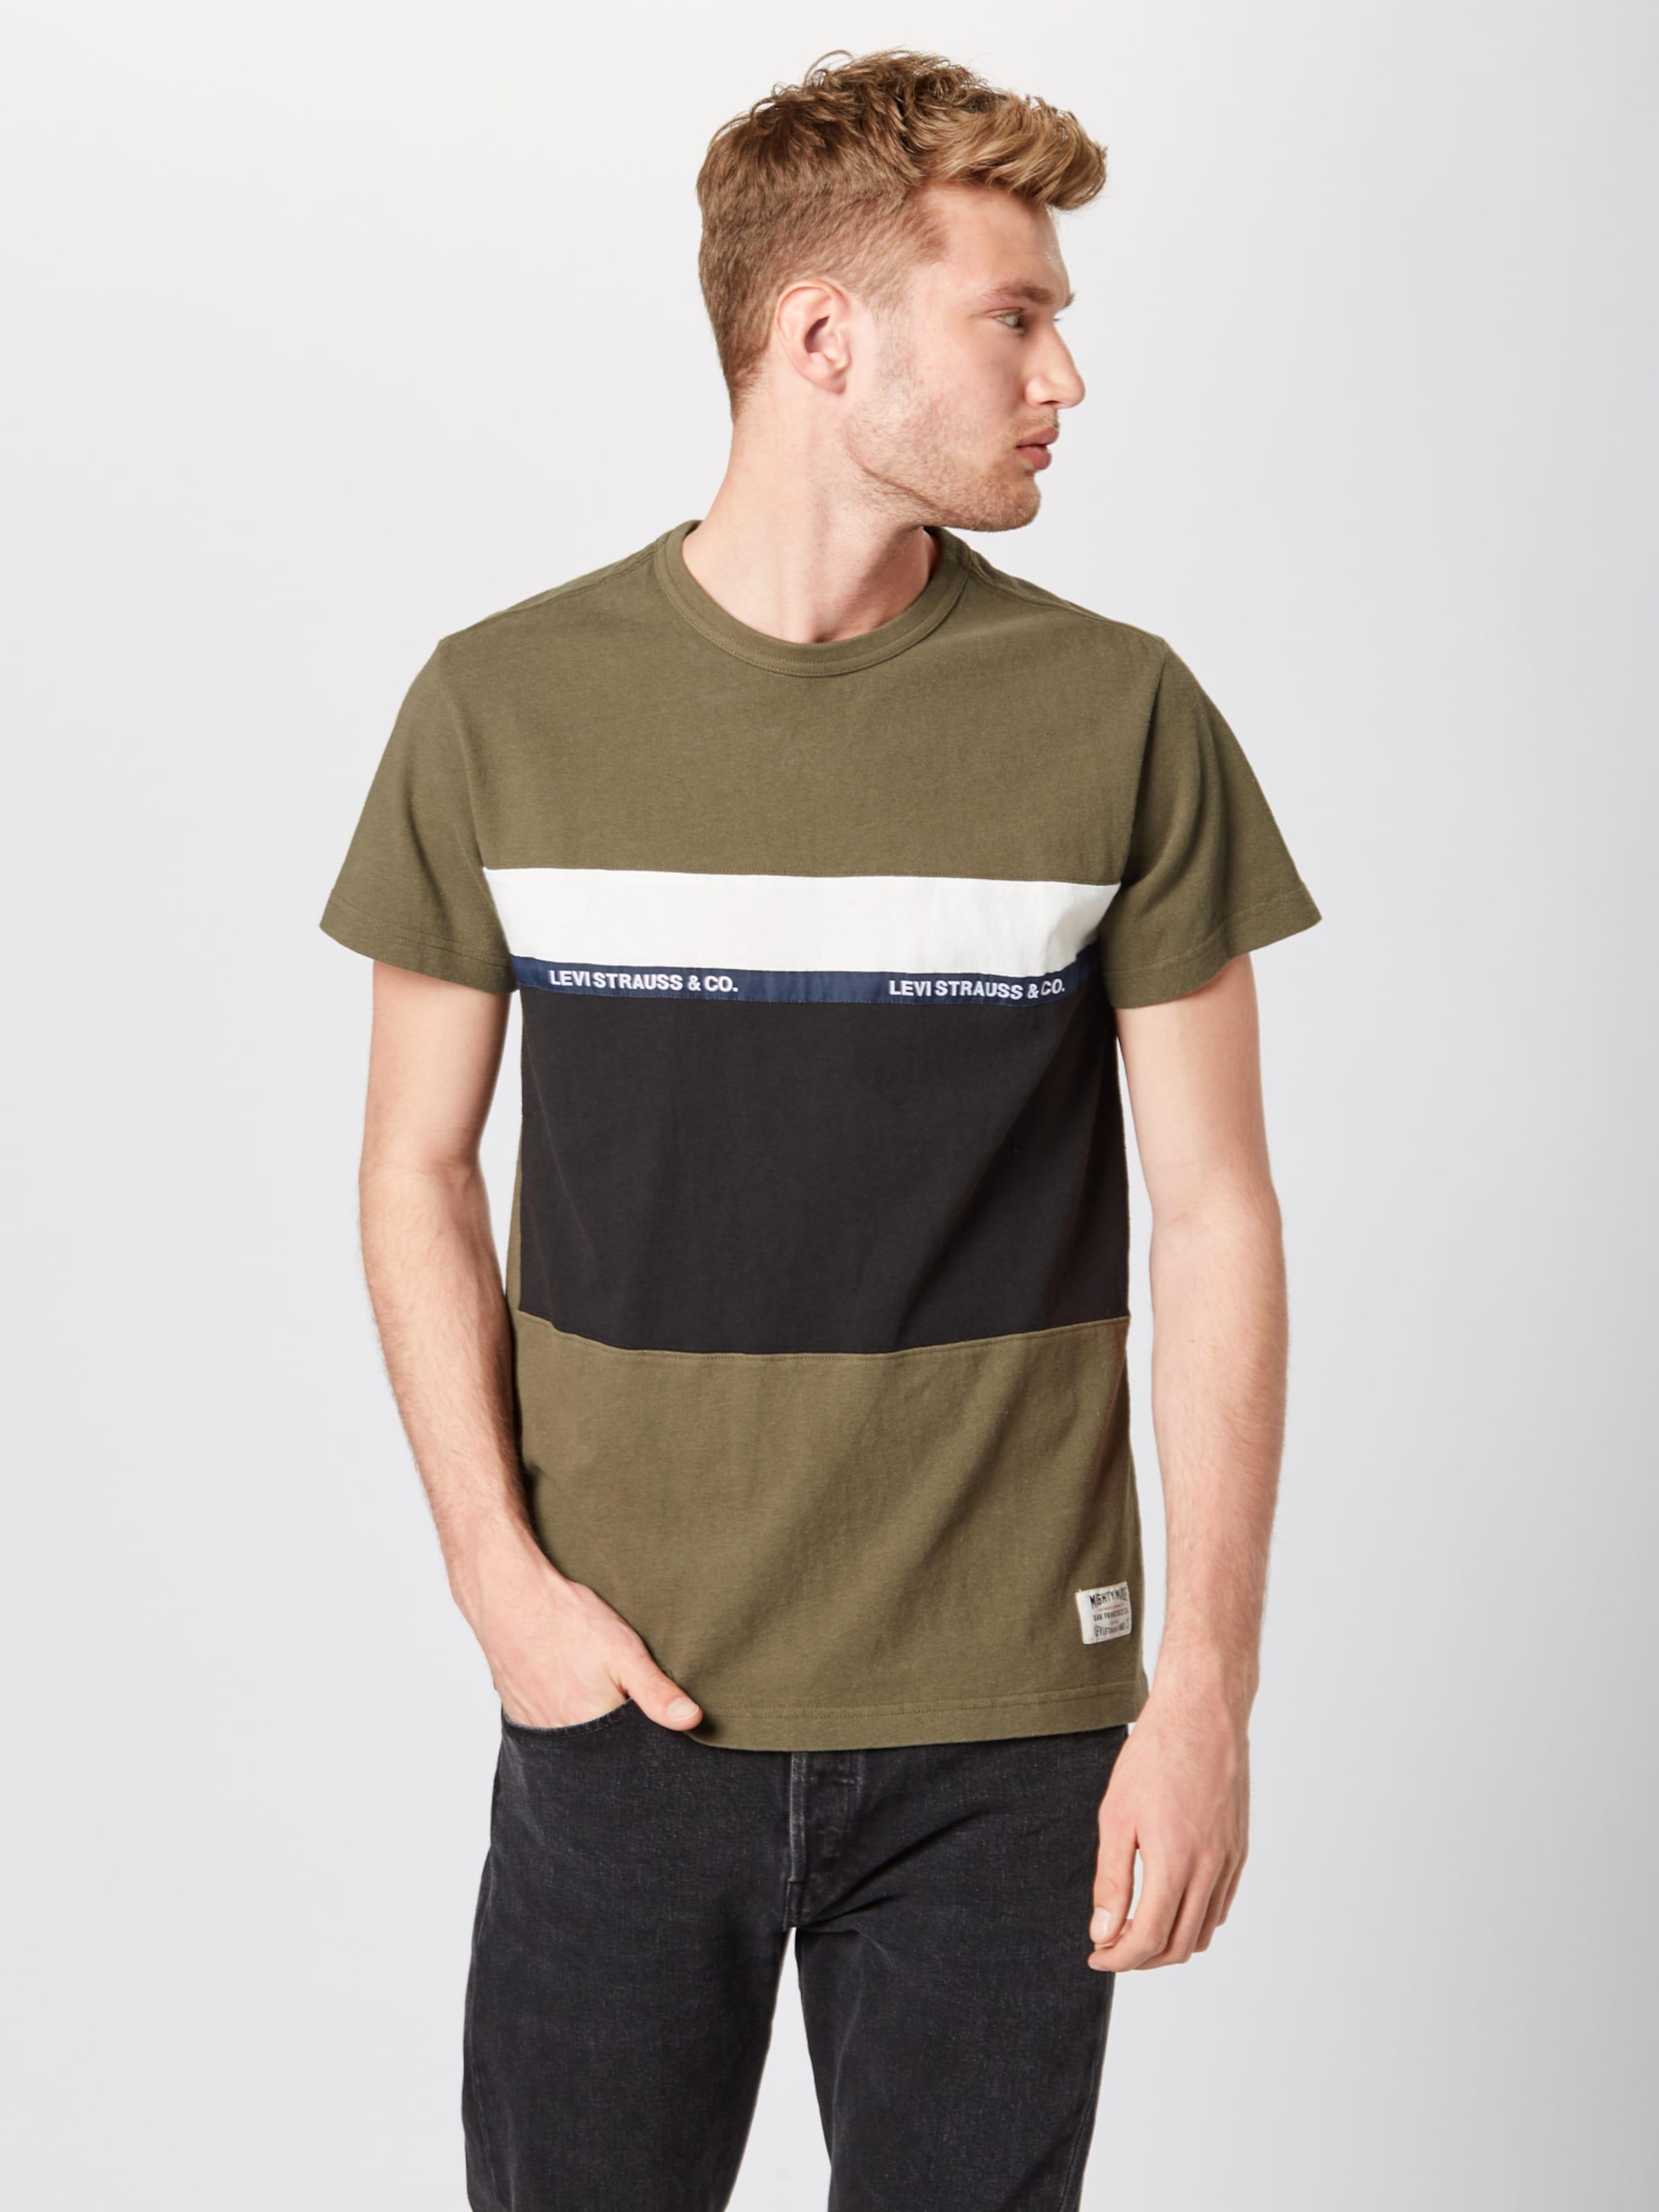 'ssmightypiecedteetapeapplique' Levi's In Oliv In Oliv Levi's Shirt 'ssmightypiecedteetapeapplique' Shirt nw80kOPX